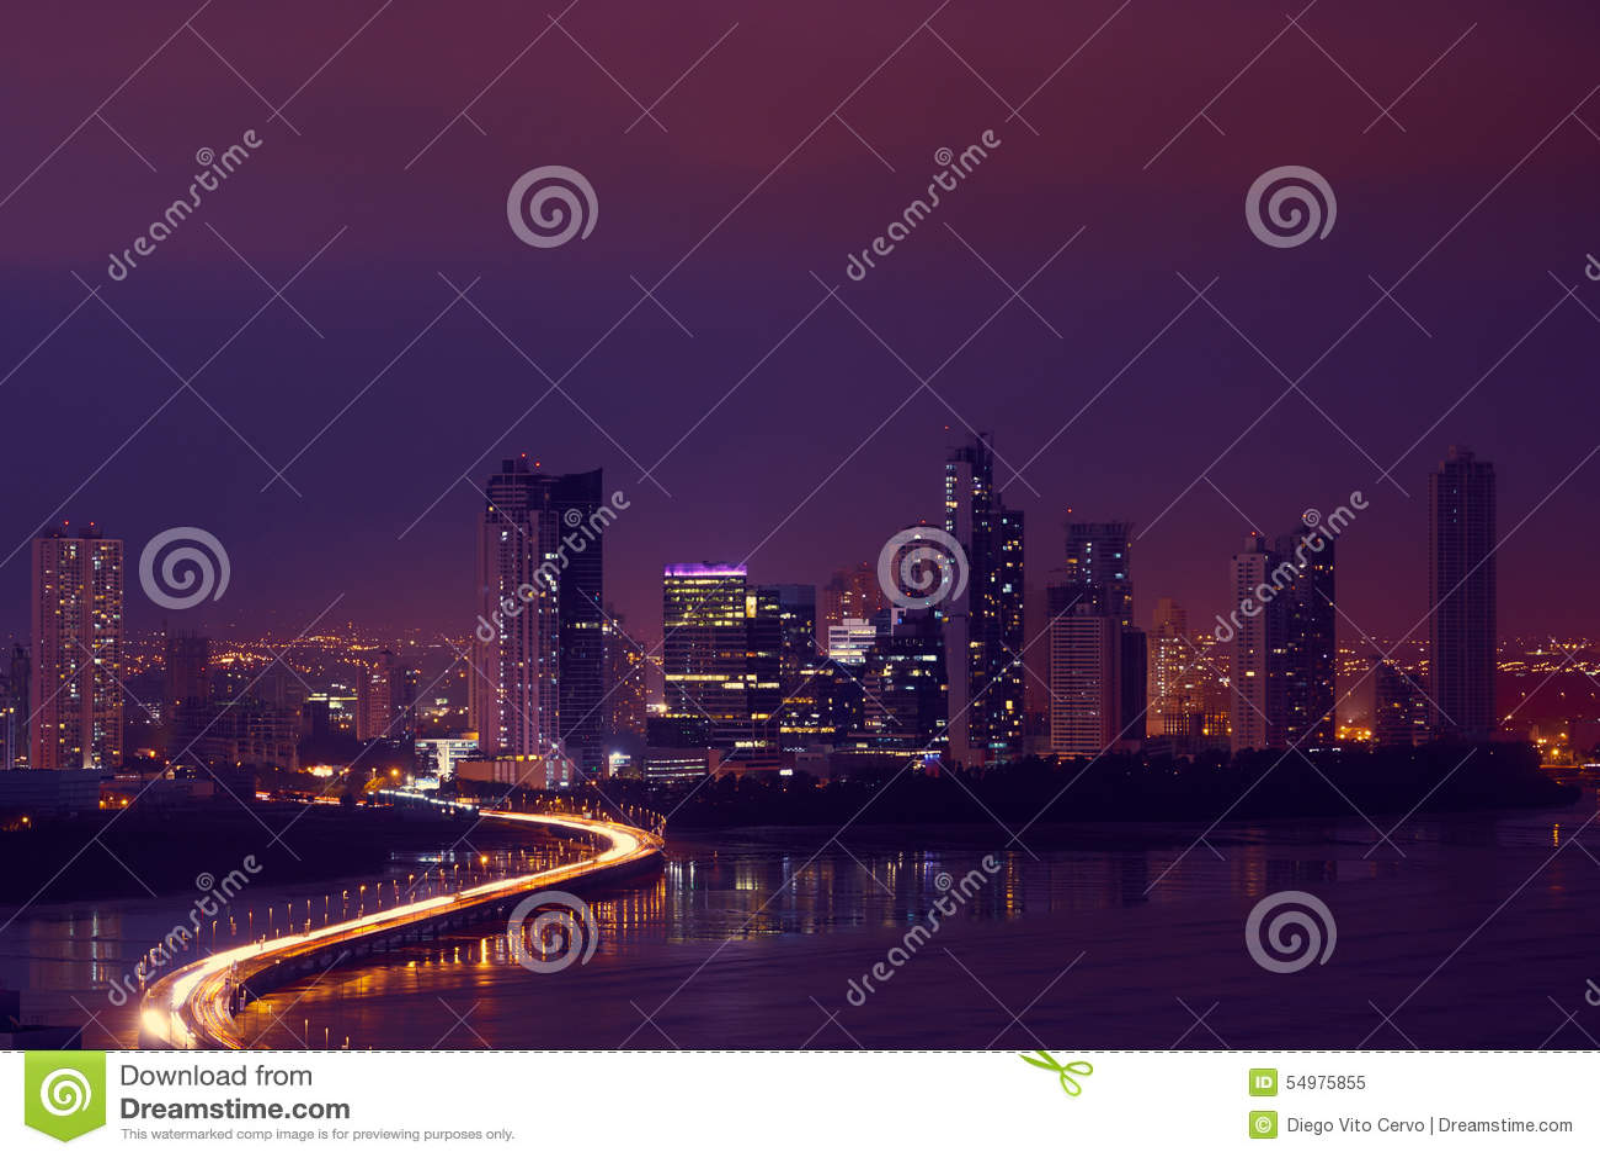 Panama City Night Skyline With Car Traffic On Highway